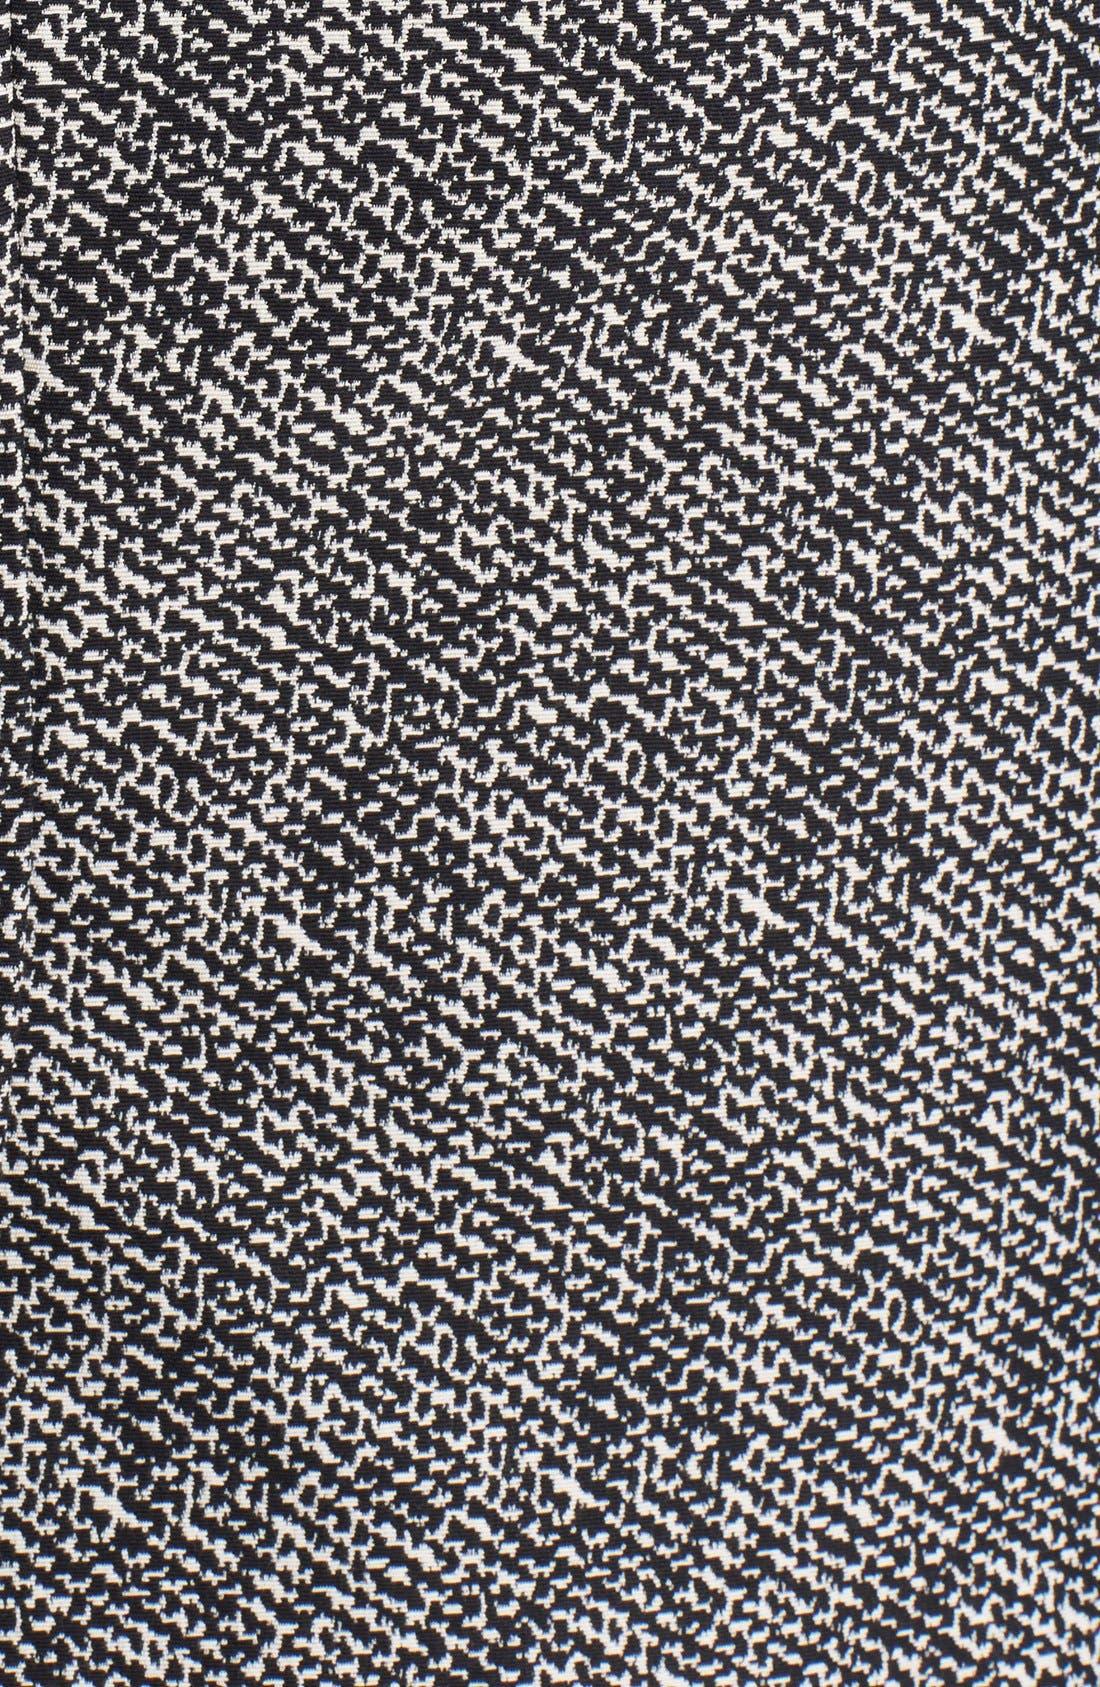 Alternate Image 3  - Max Mara 'Eros' Pencil Skirt